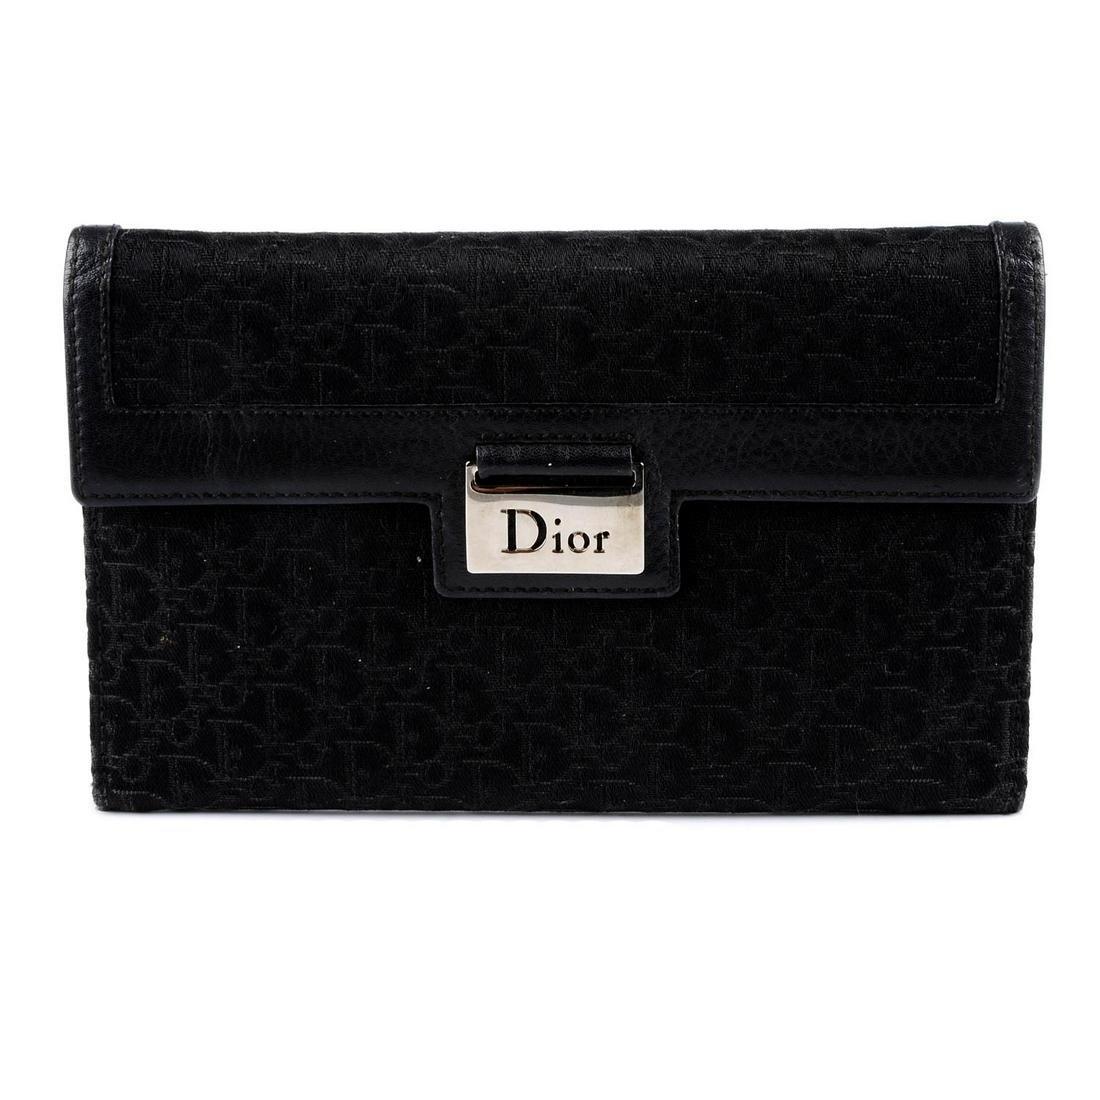 CHRISTIAN DIOR - a black wallet. Designed with maker's